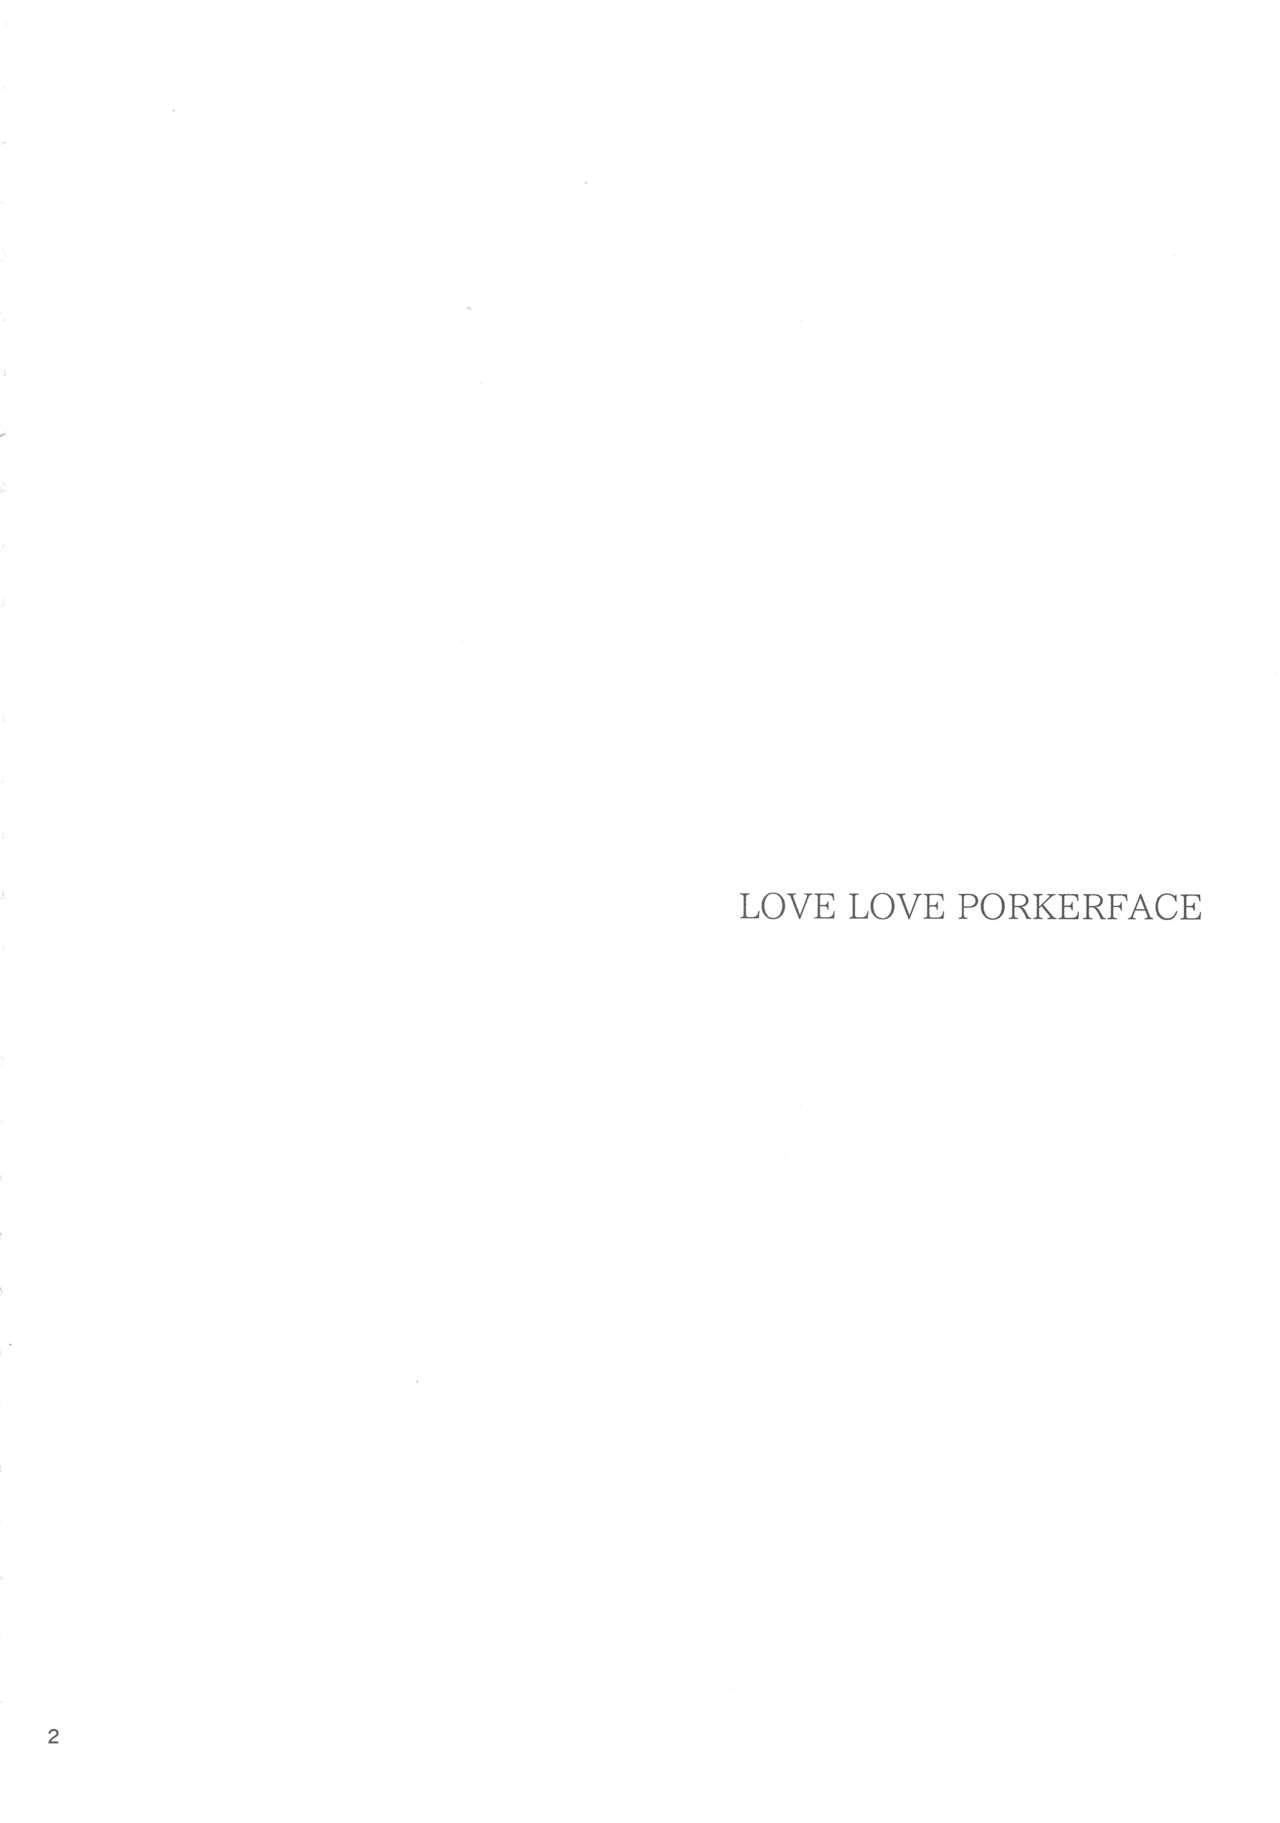 LOVE LOVE PORKERFACE 2